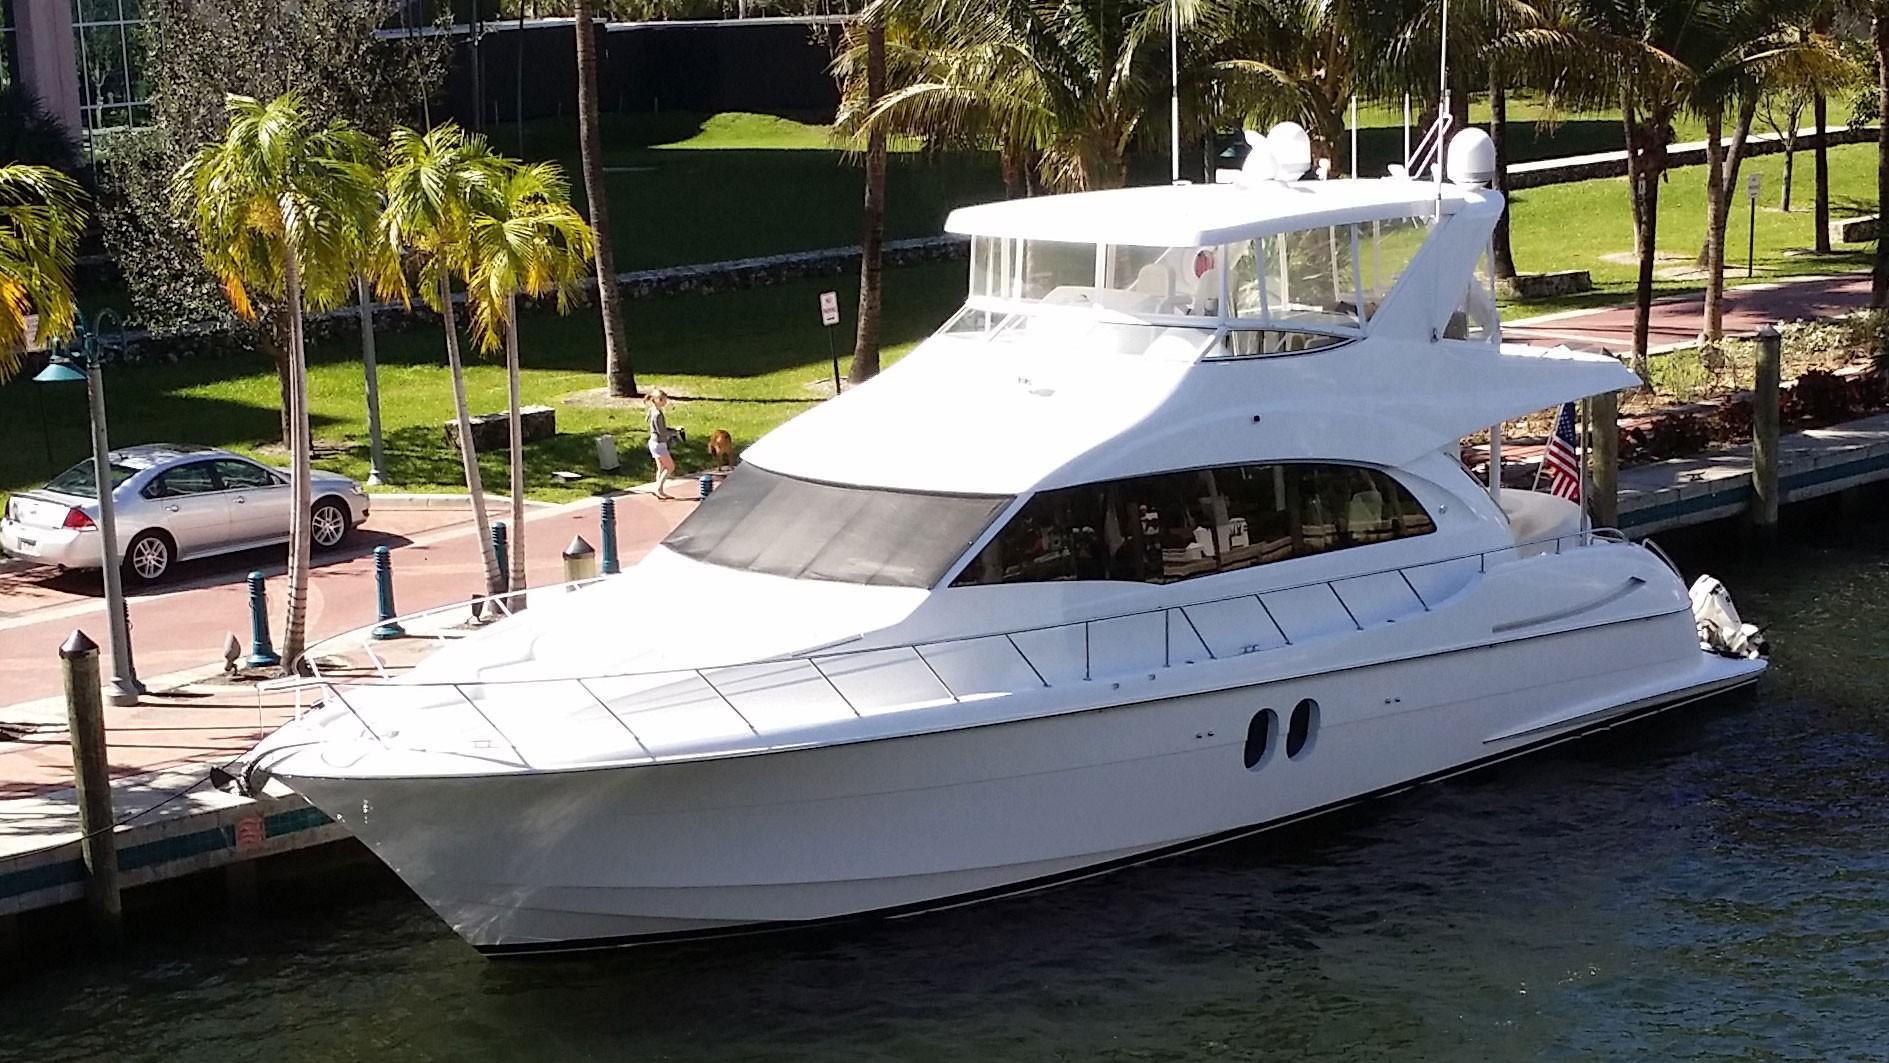 60' Hatteras Motor Yacht SEA GOALS